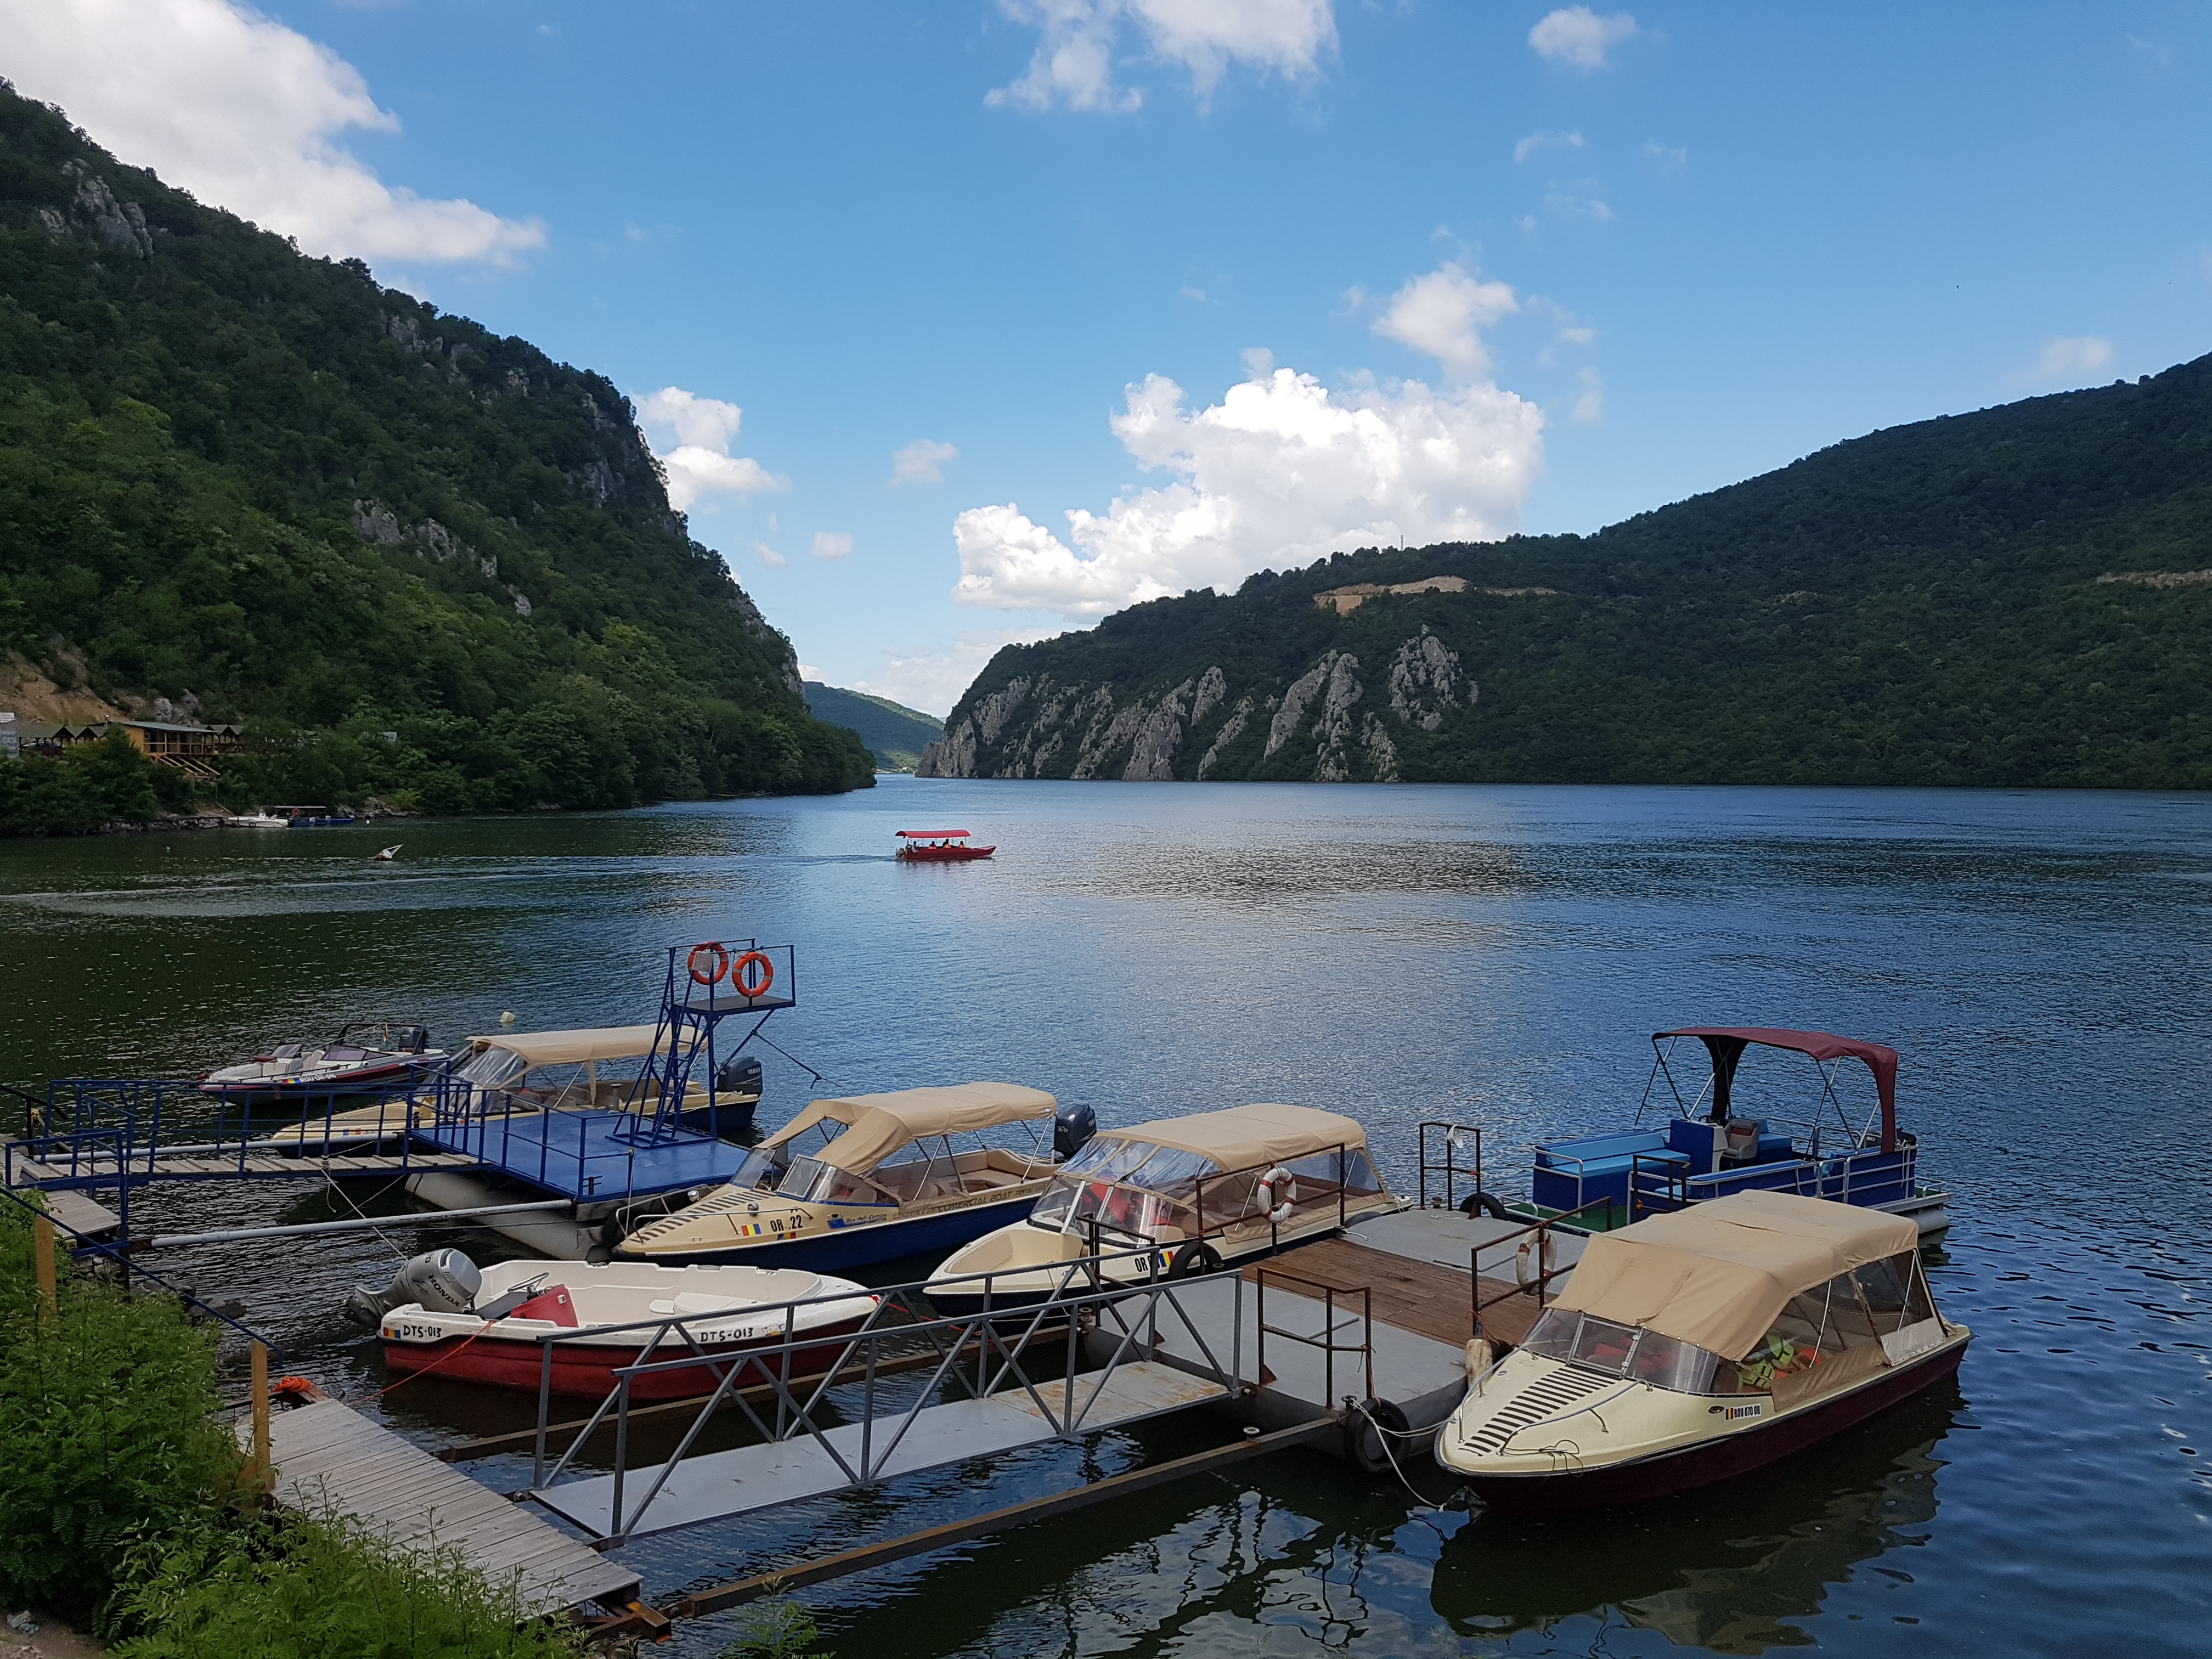 Agrement nautic - Cazanele Dunării